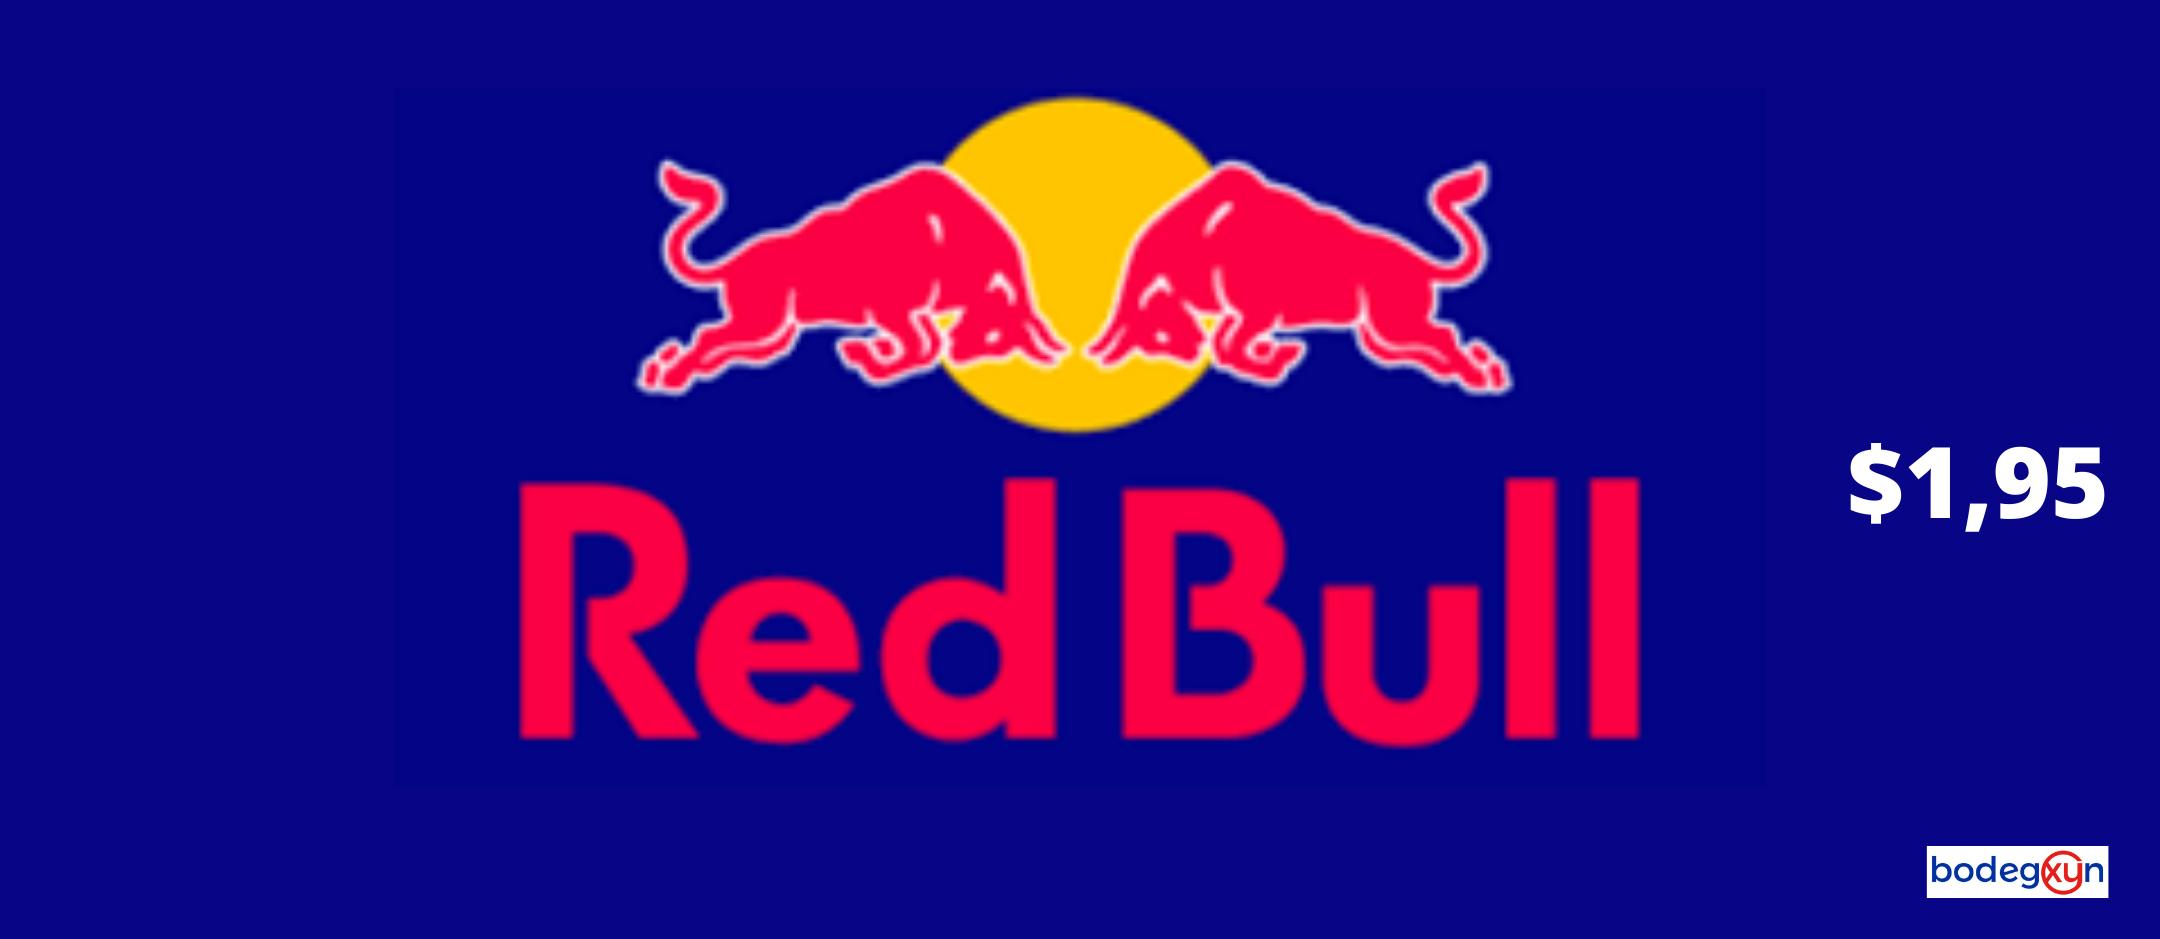 Bodegon XY red bull